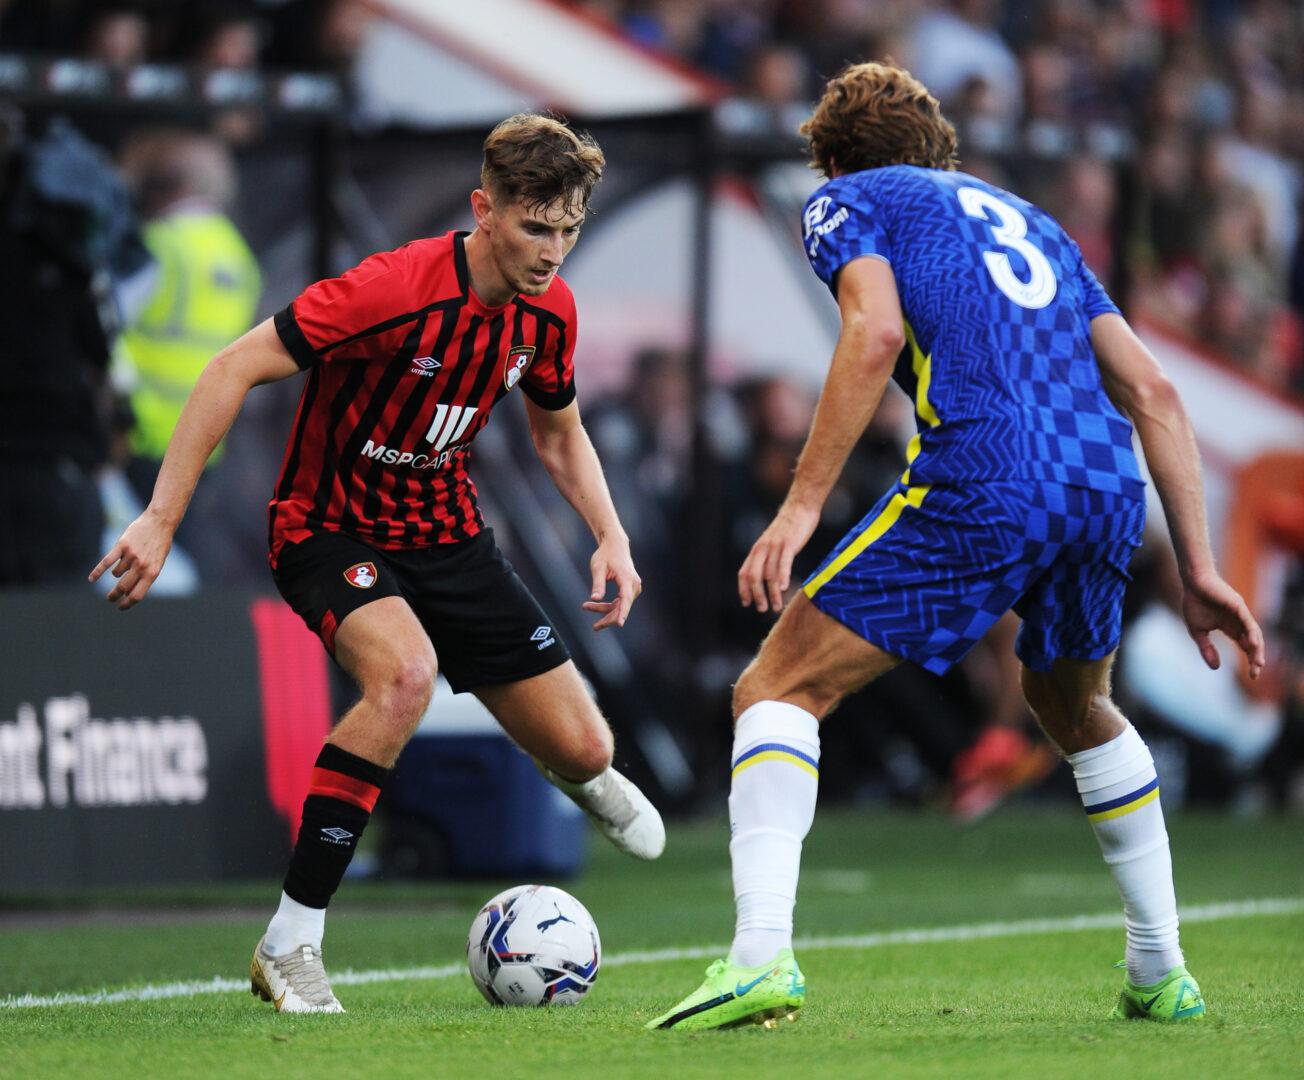 Bournemouth-Profi David Brooks hier im Carabao Cup gegen Chelsea